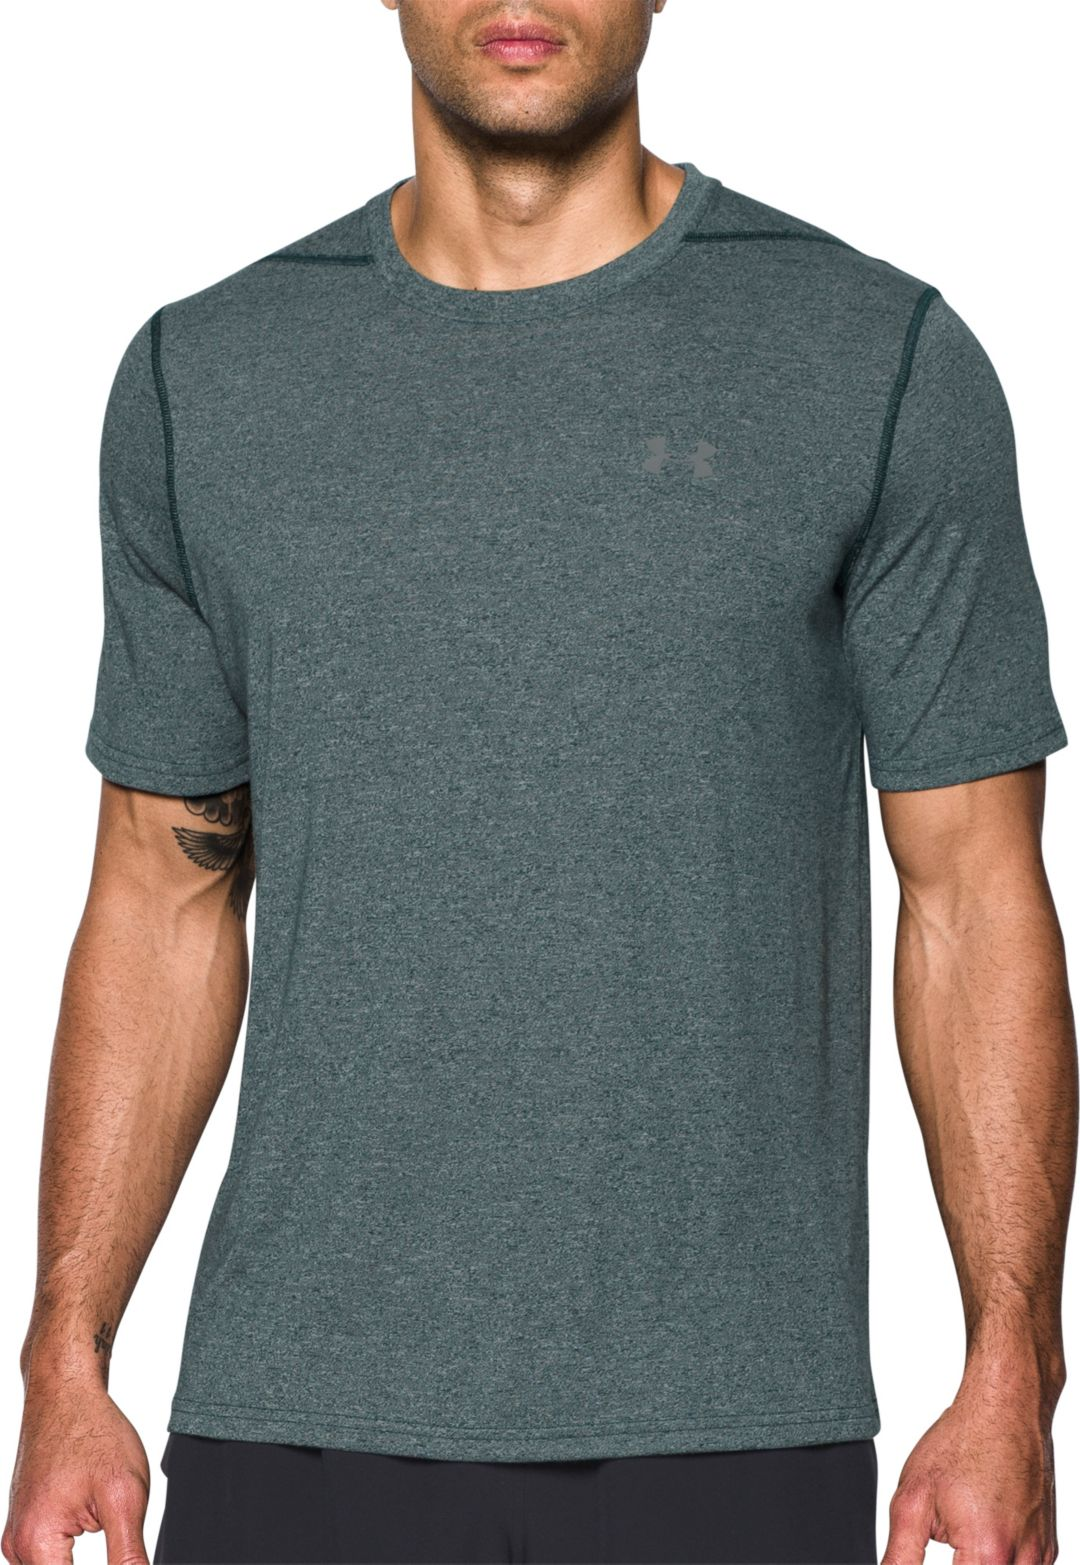 b1ef67e305 Under Armour Men's Threadborne Siro Heather Print T-Shirt